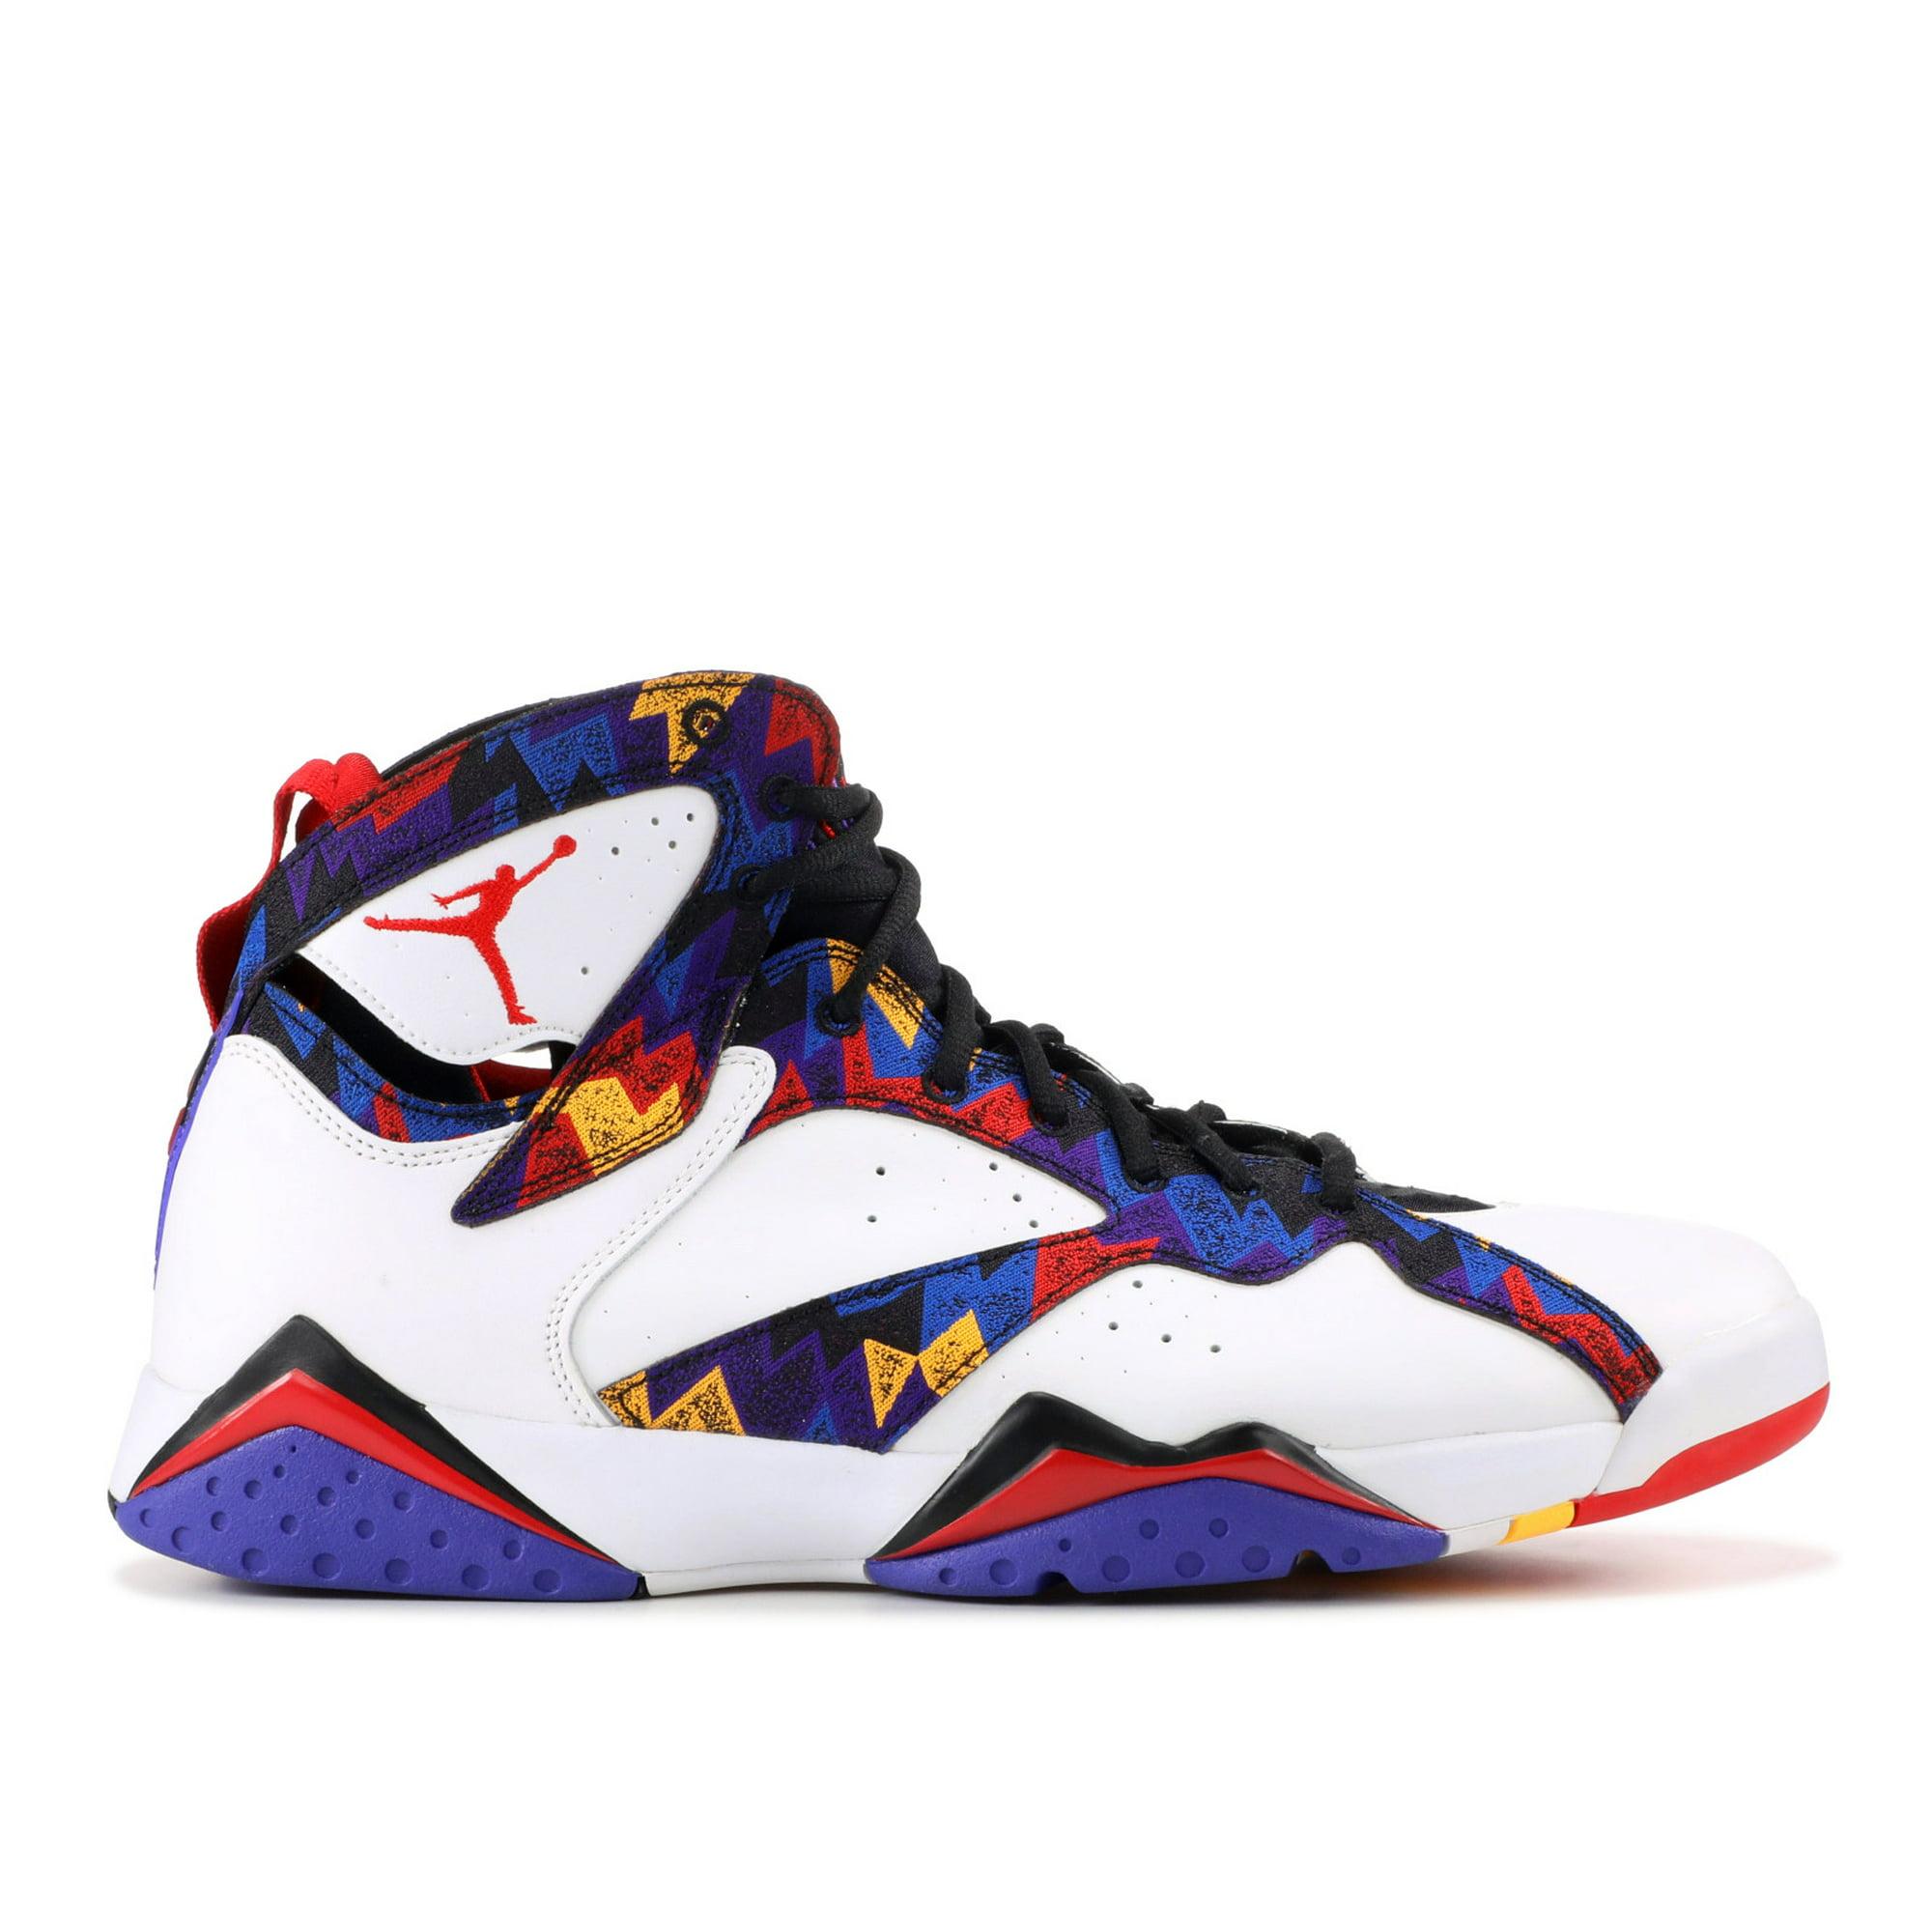 sports shoes 8726e 0ad74 Air Jordan - Men - Air Jordan 7 Retro  Nothing But Net  - 304775-142 - Size  9   Walmart Canada